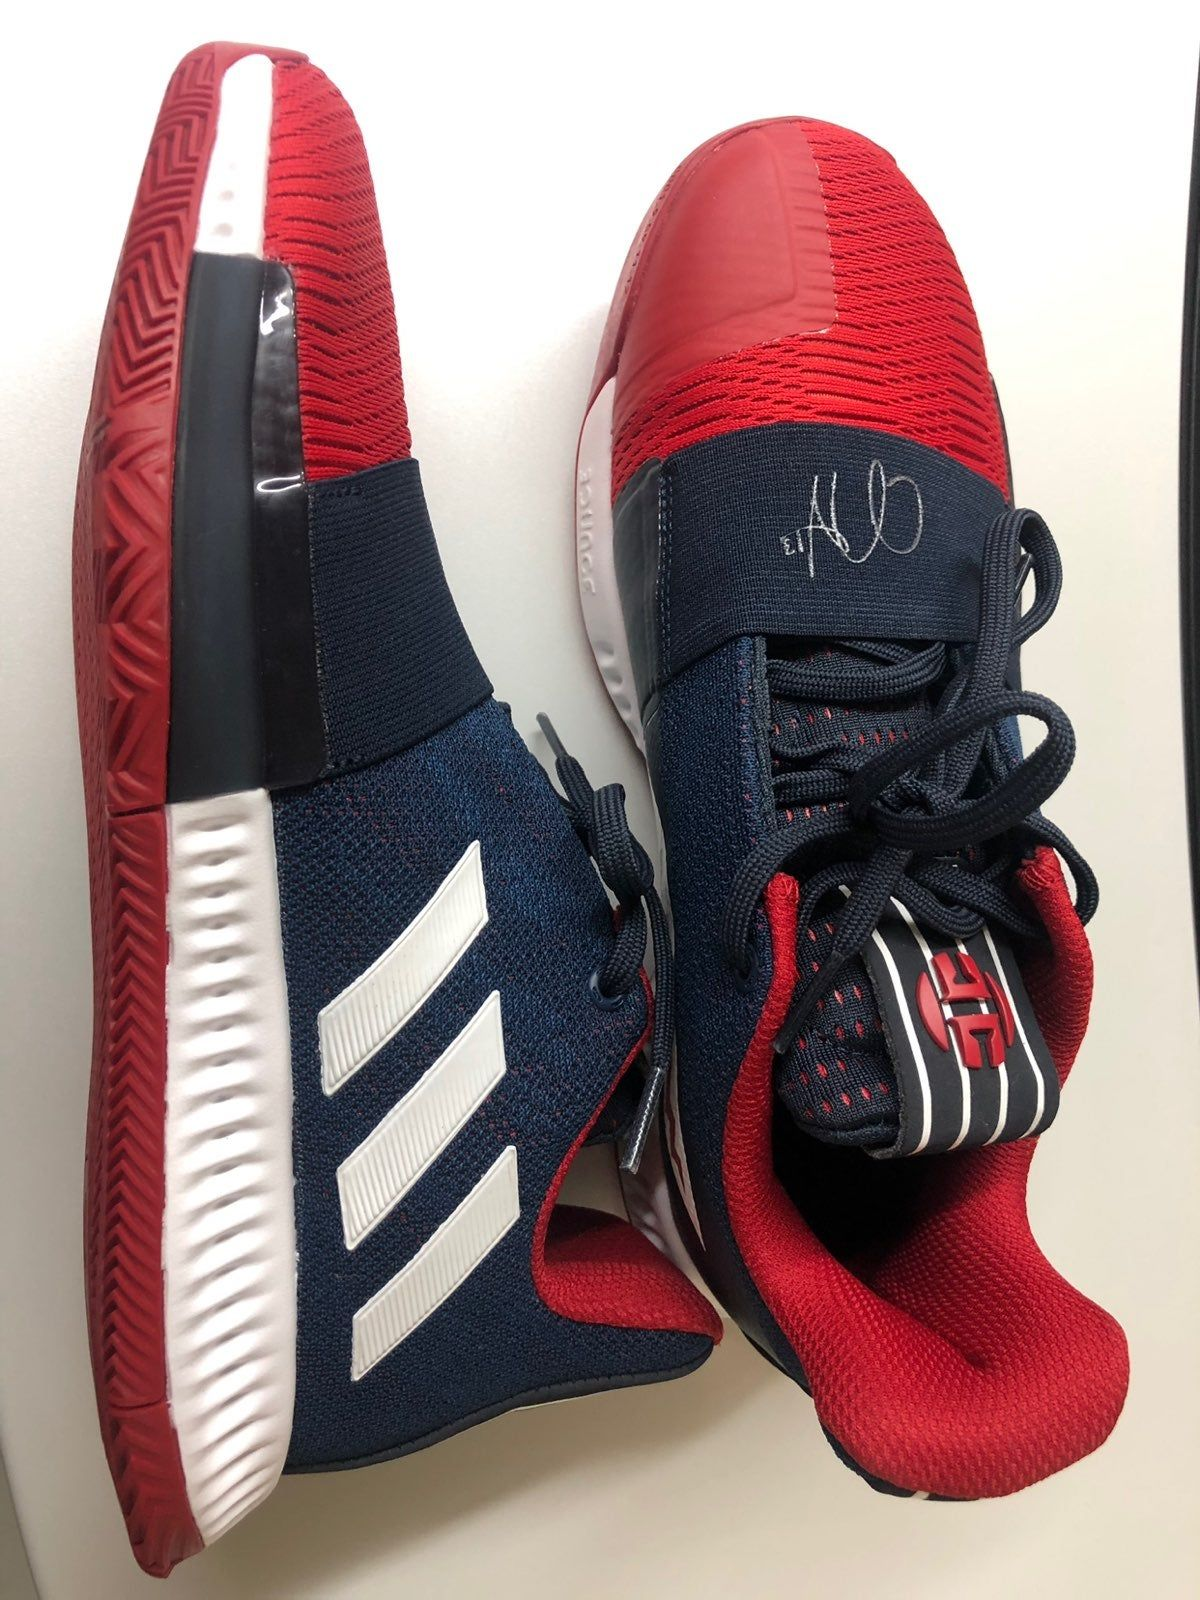 Adidas, James harden, Adidas samba sneakers